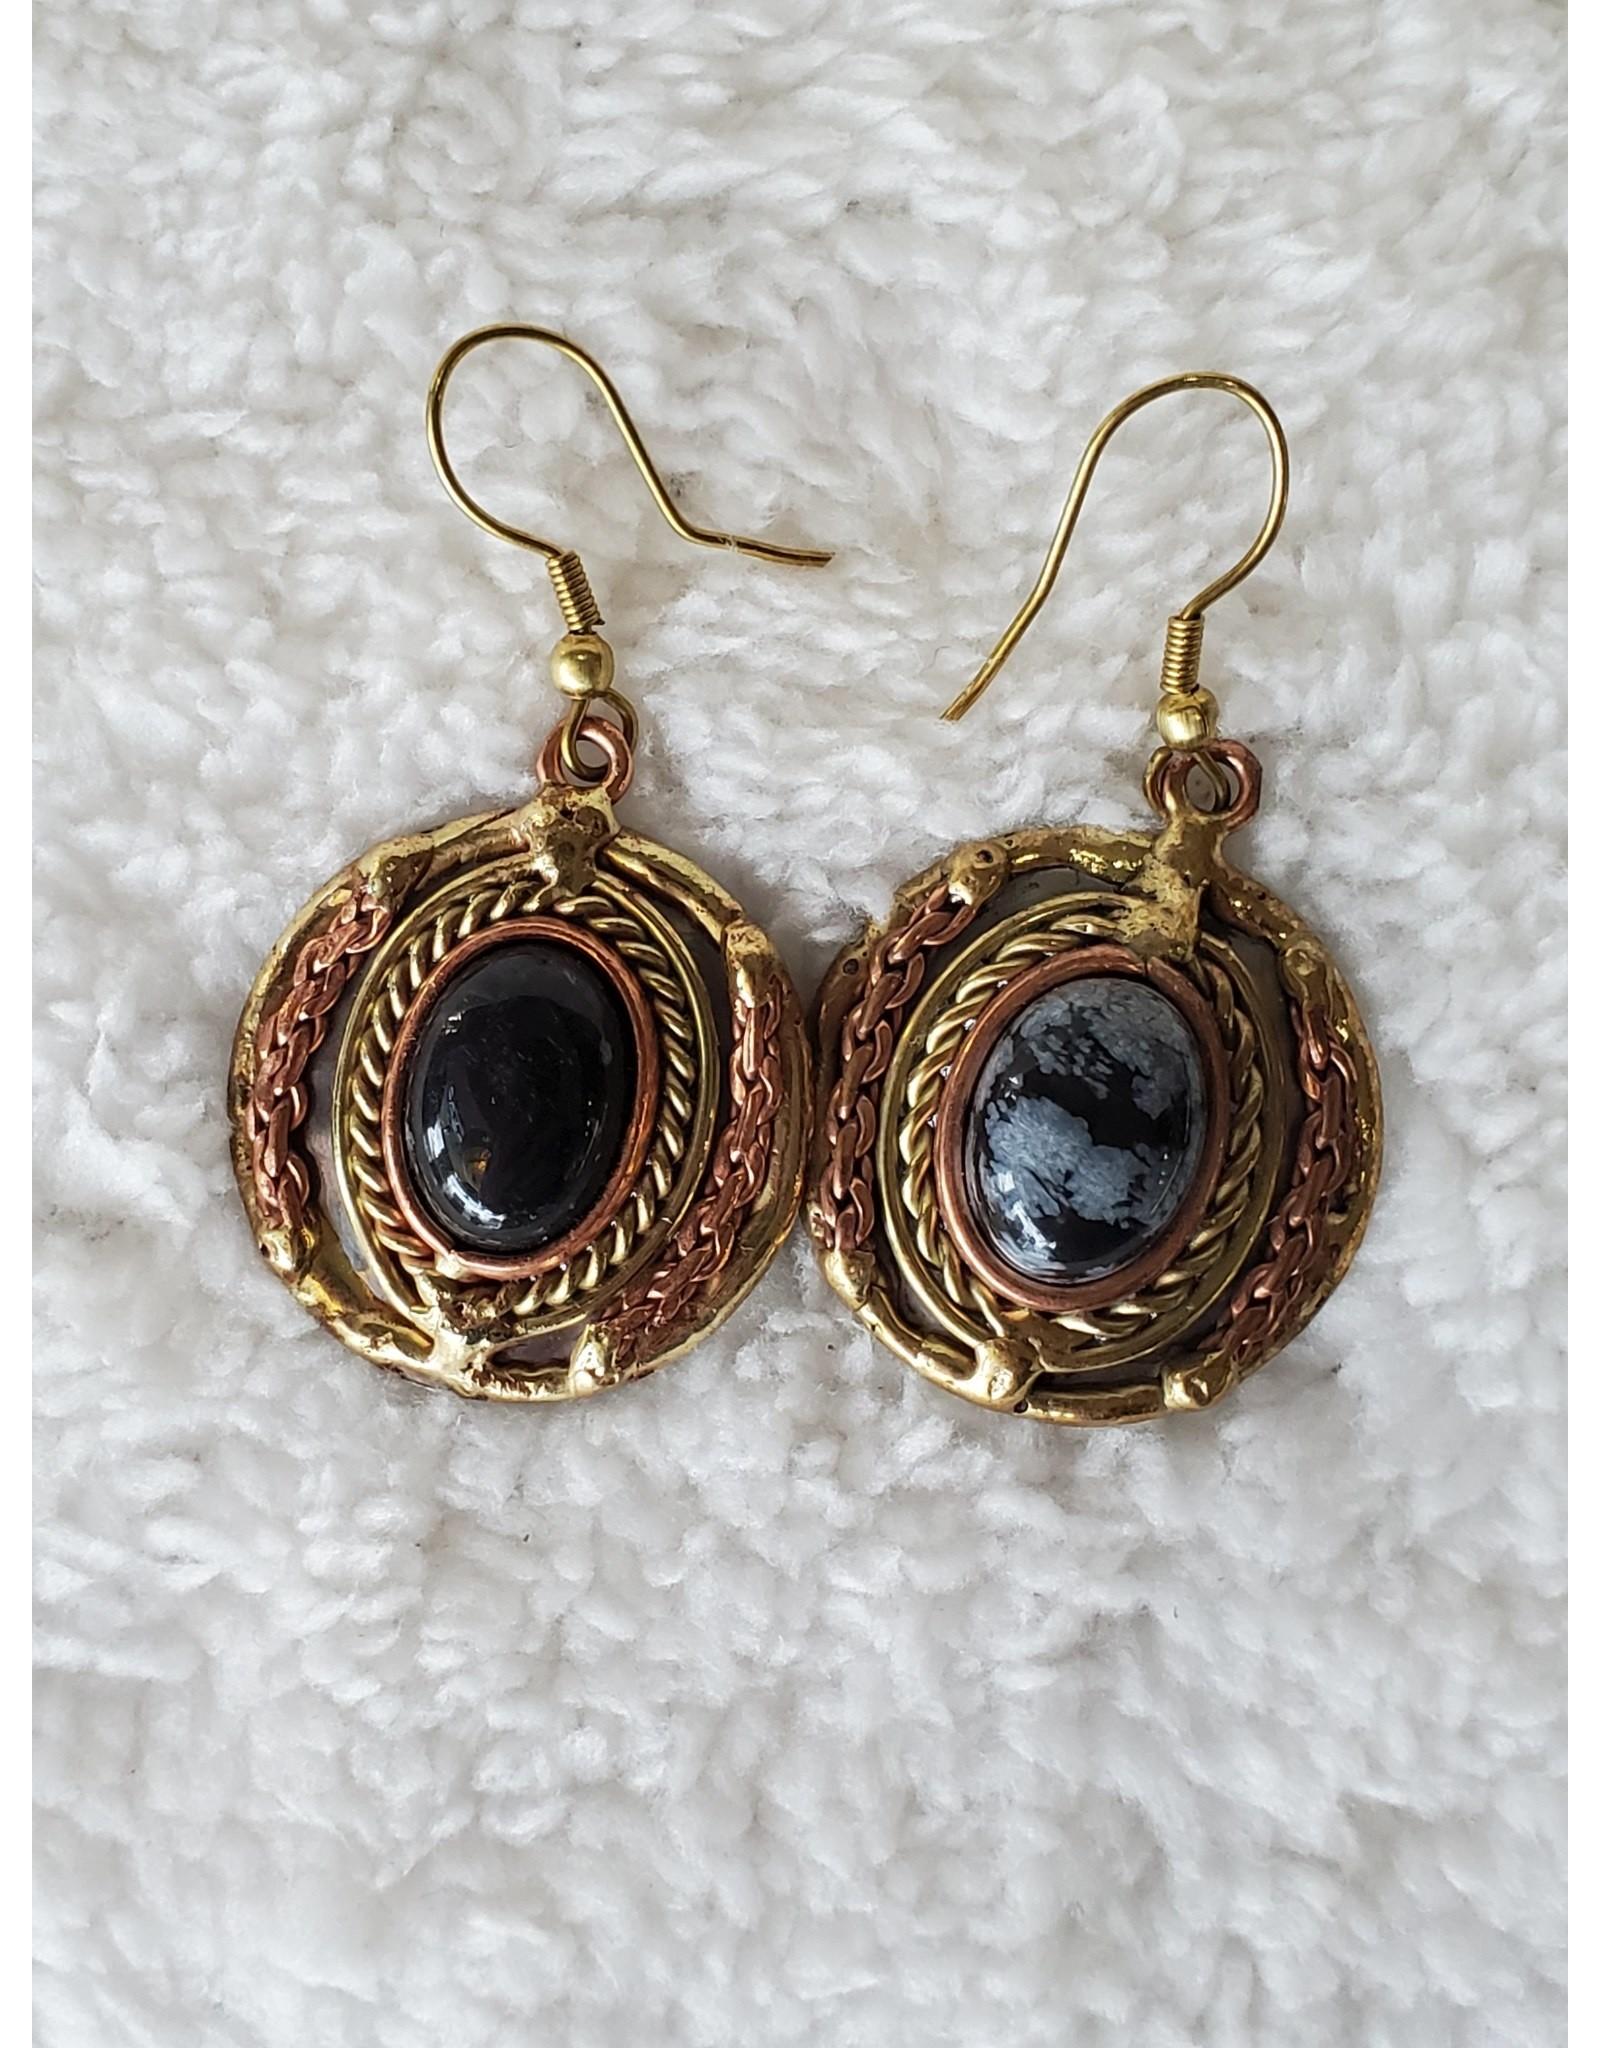 Mixed Metal & Snowflake Obsidian Earrings